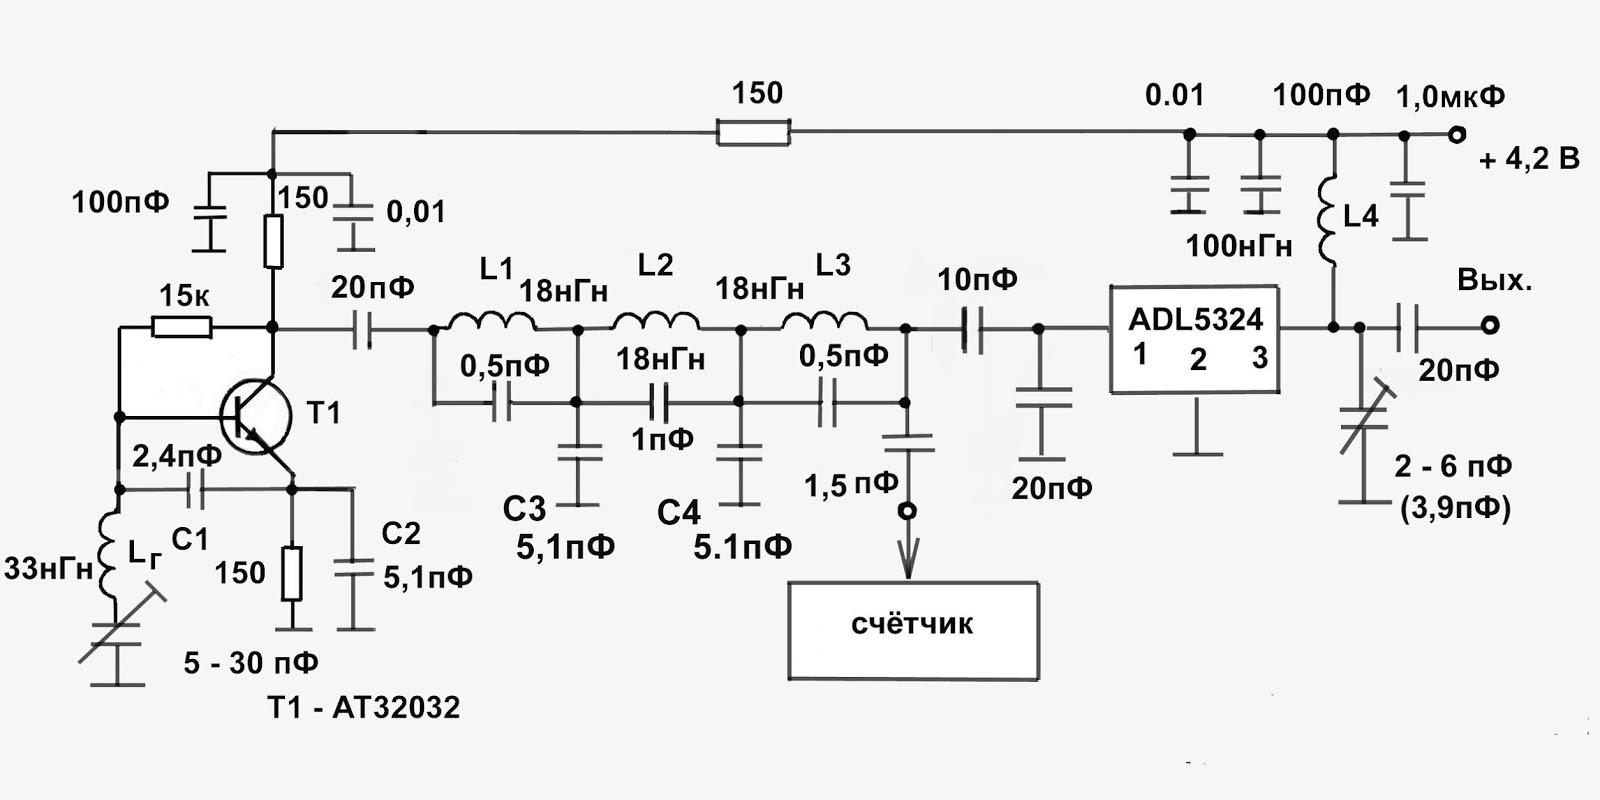 Схема генератора на 1 мгц фото 3